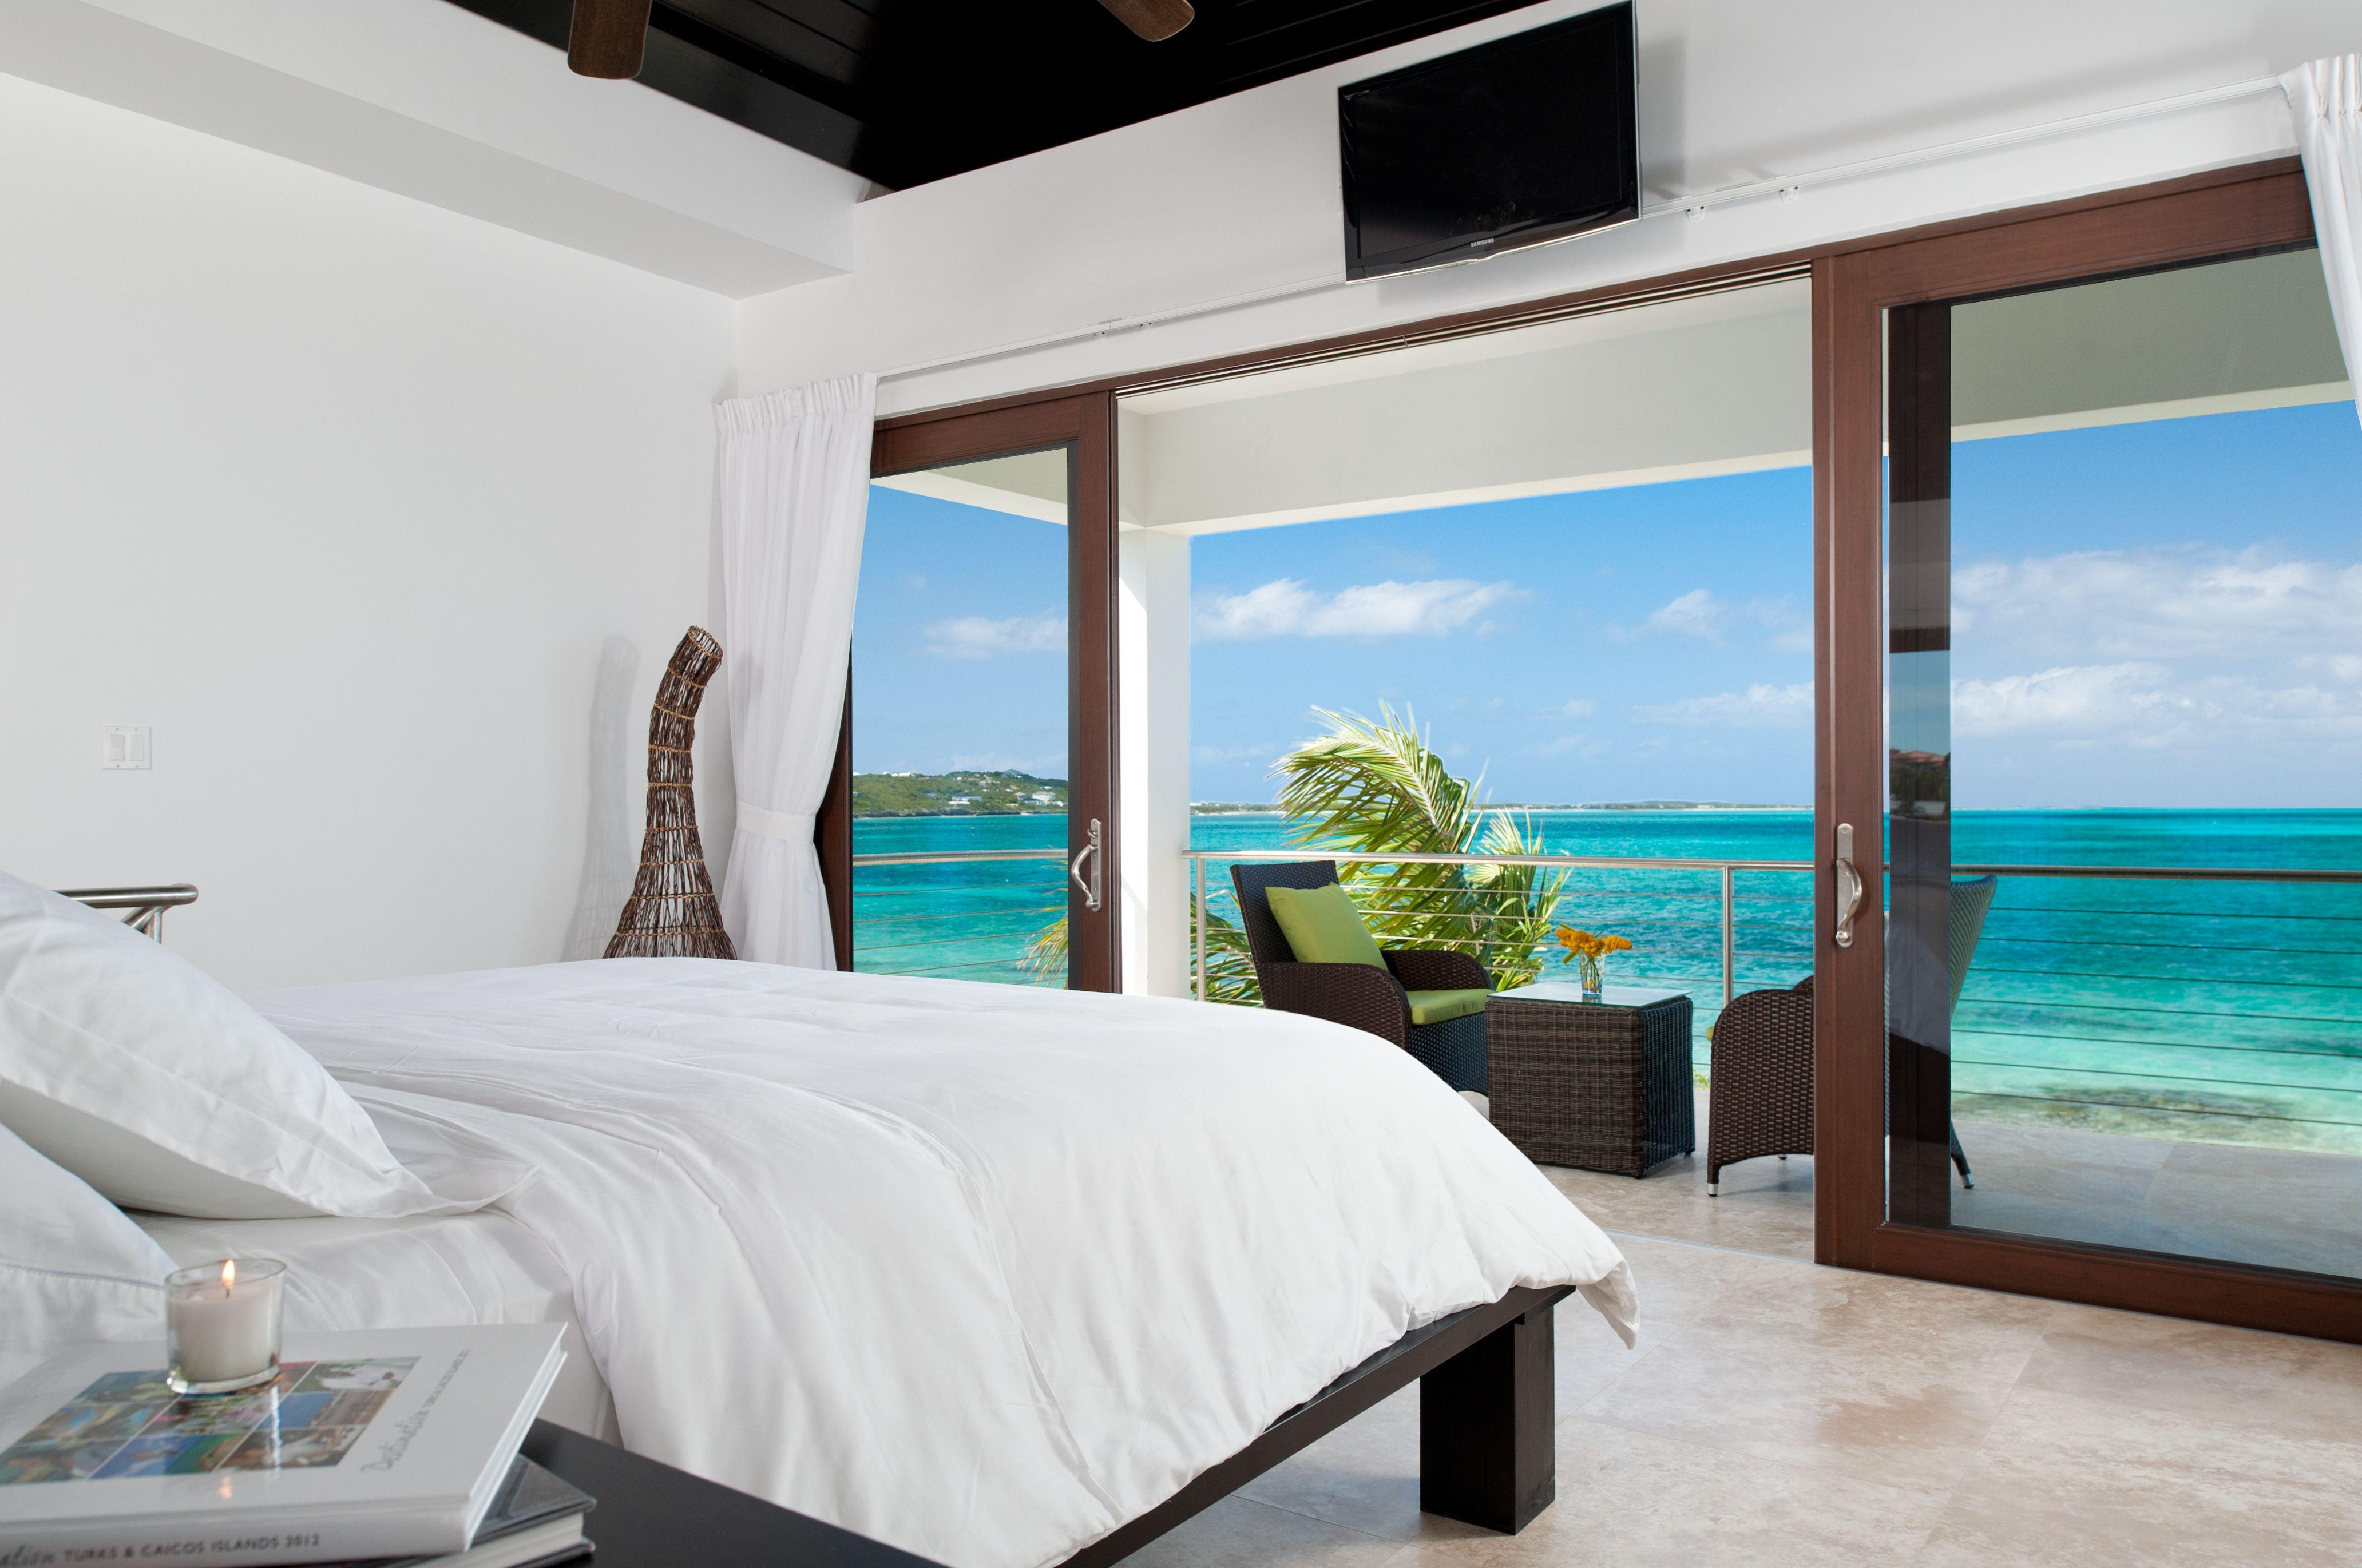 Ocean Edge 1BR Beachfront Villa on Grace Bay Beach in